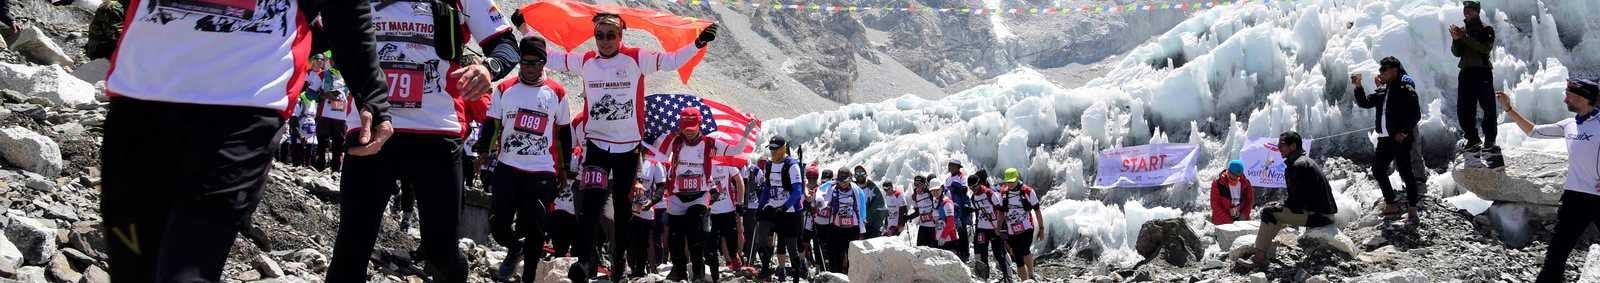 Start line, Tenzing-Hillary Everest Marathon, Nepal